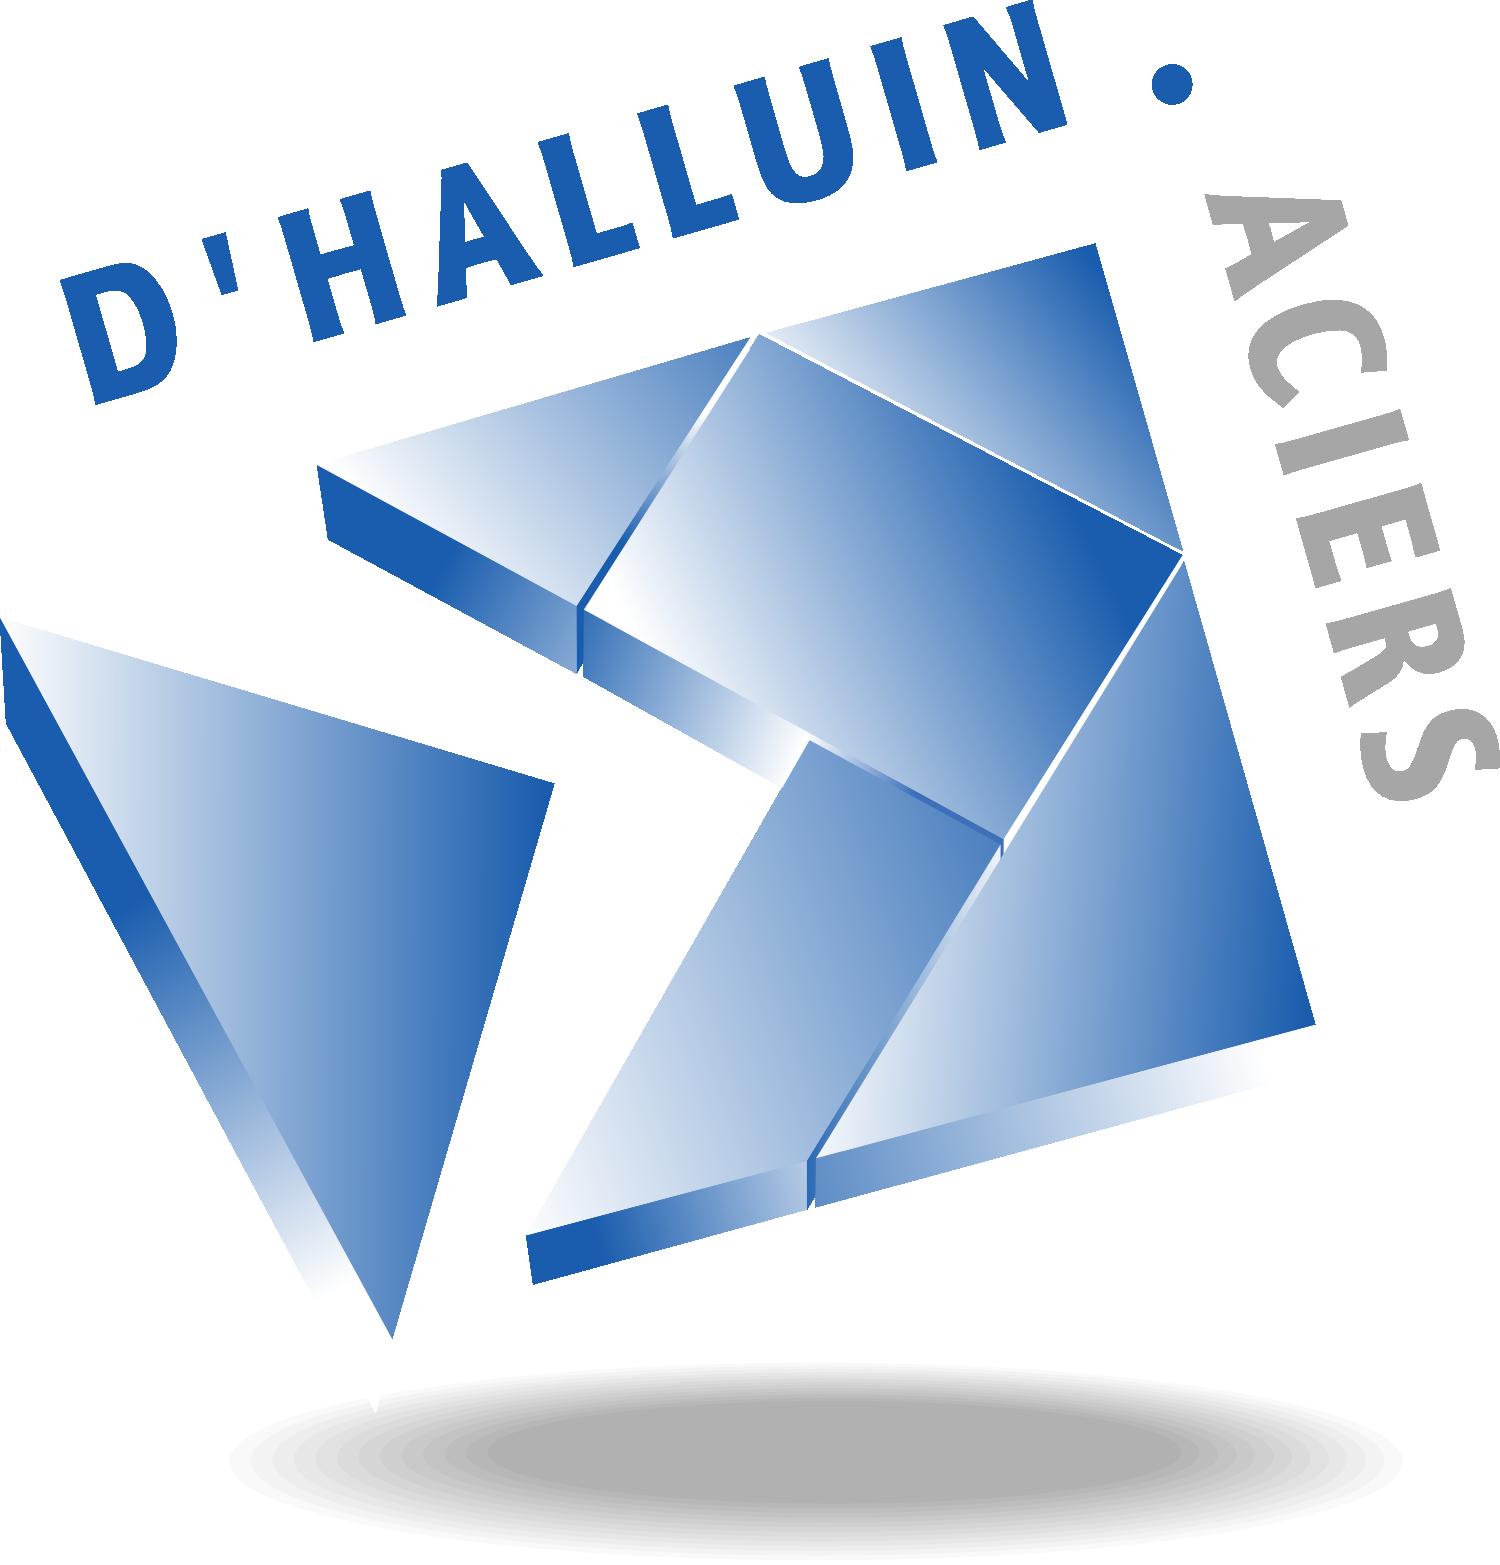 1602074408-halluin-stand-reseau-socoda-.png